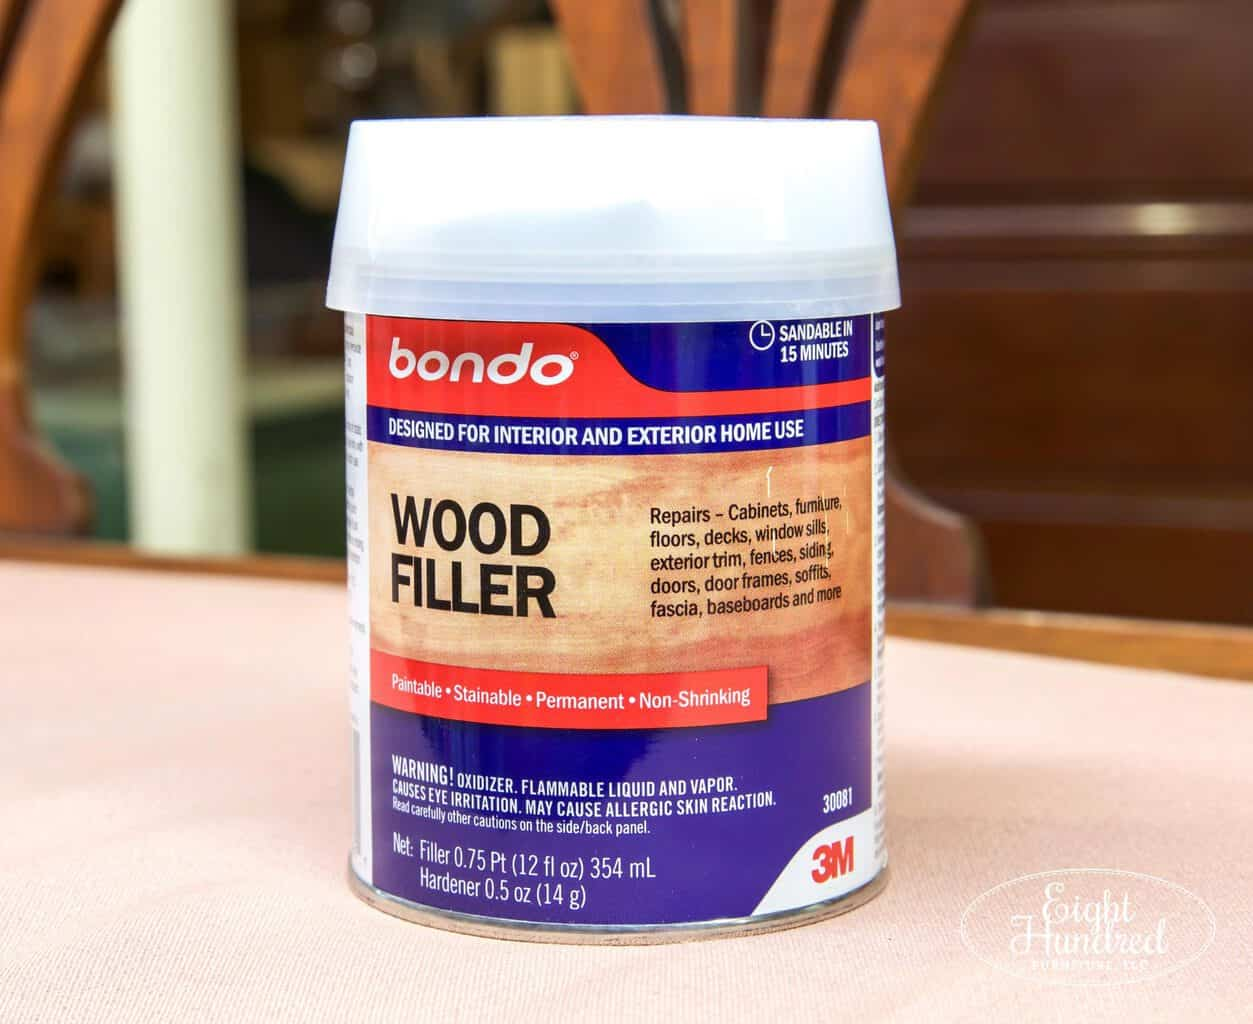 bondo wood filler, 3m, wood filler